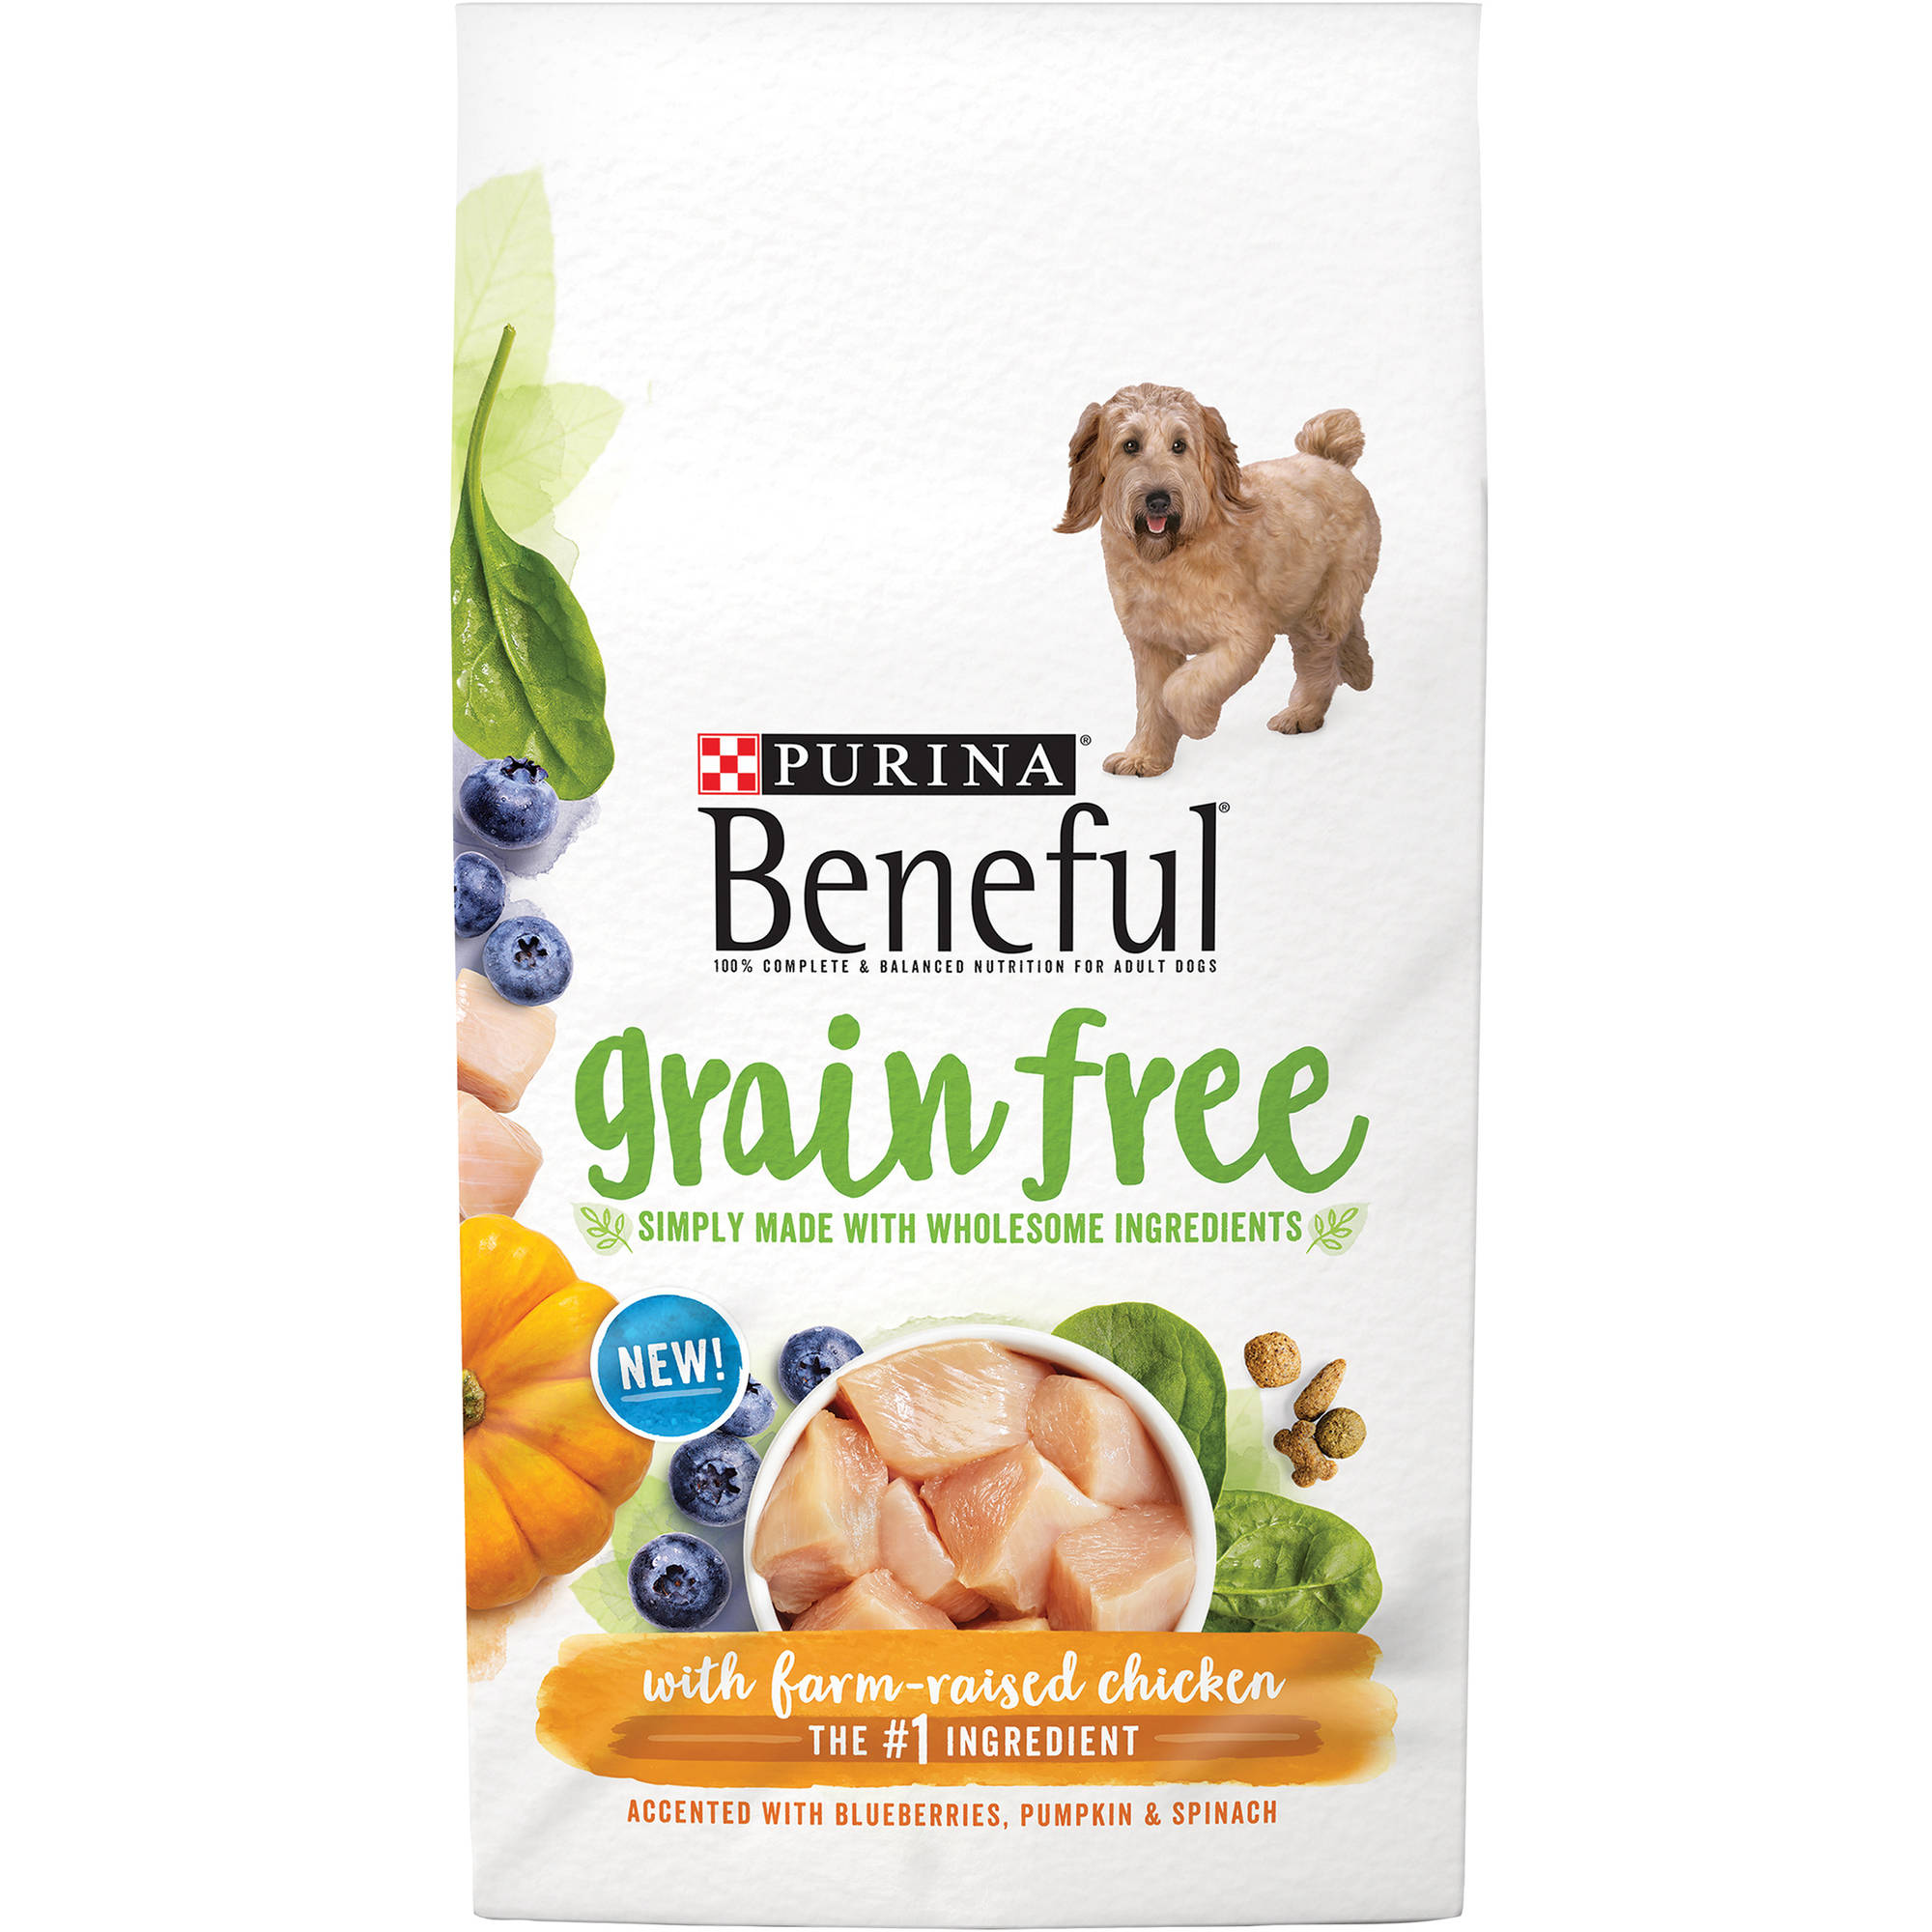 Beneful Grain Free Dry Dog Food - Chicken - 4.5lb